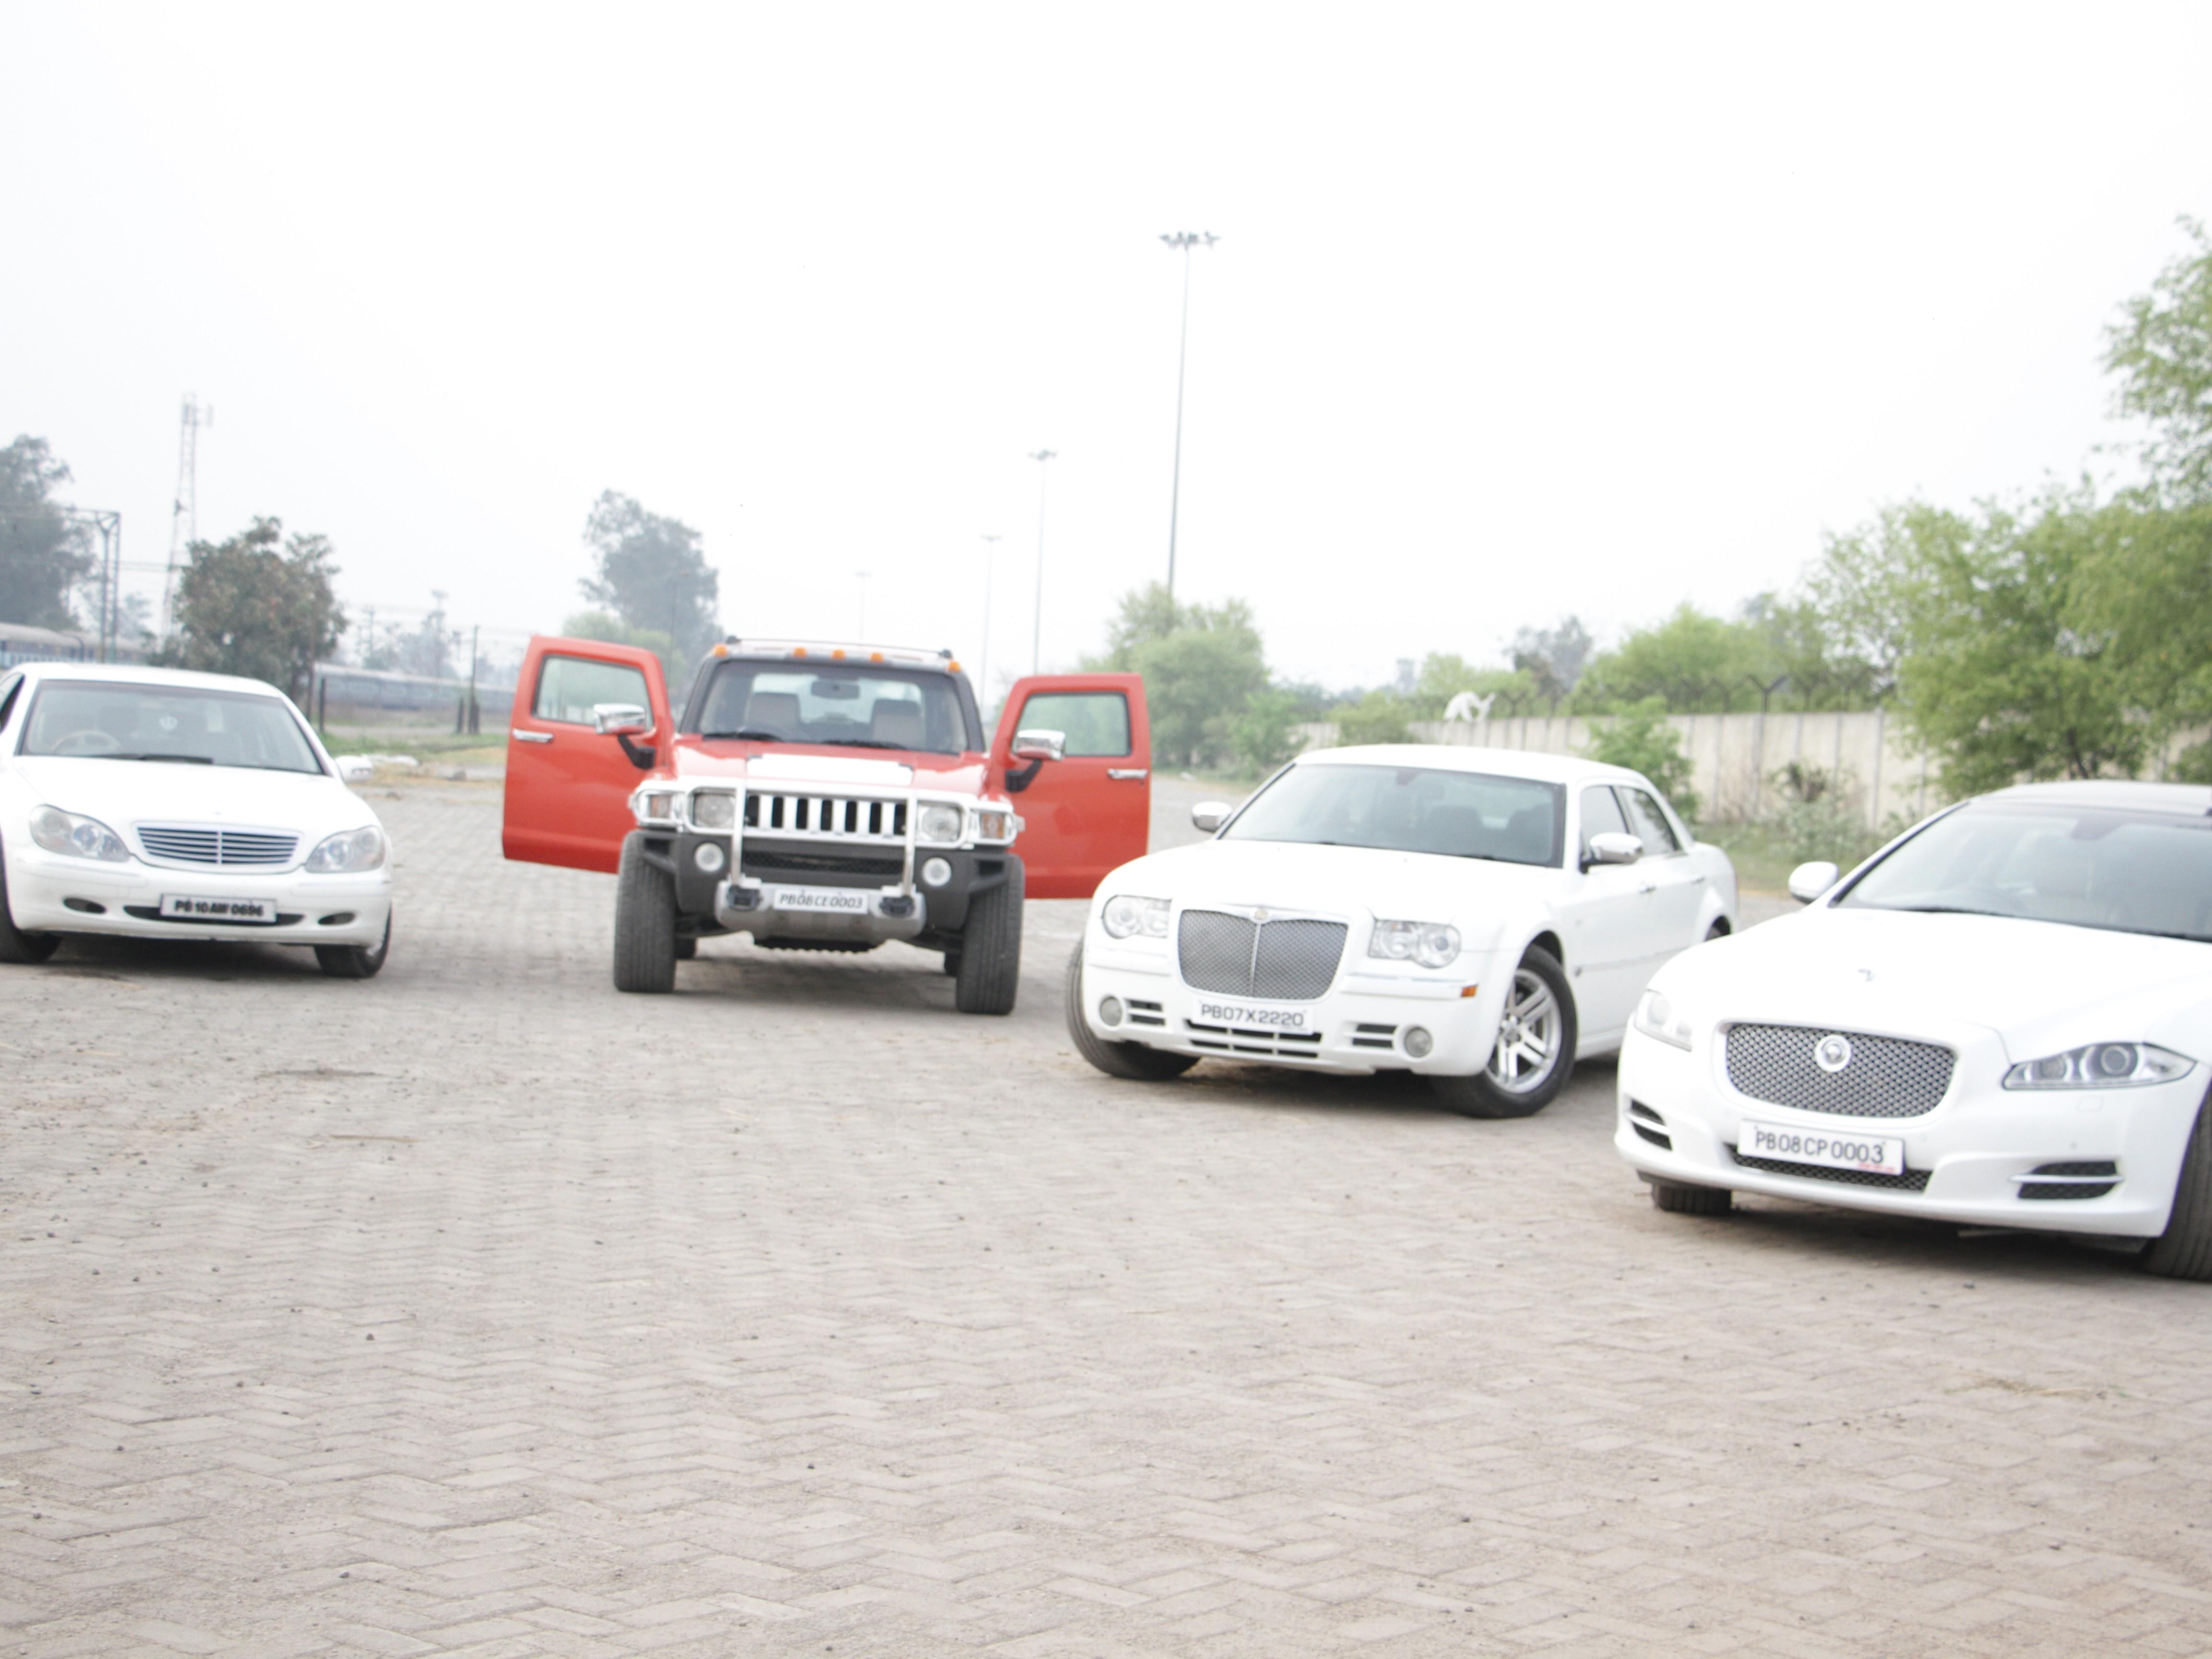 NO 1 CAR RENTAL COMPANY IN NORTH INDIA                                                                                                                                                                                                                                                                                                                                                                                                                                                                                                                                                                                                                                                                                                                                                                                                                                                                                                                                                                                                                                                                                                                                                                                                                                                                                                                                                                                                                                                                                                                                                                                                                                                                                                                                                                                                                                                                                                                                                                                                                                          